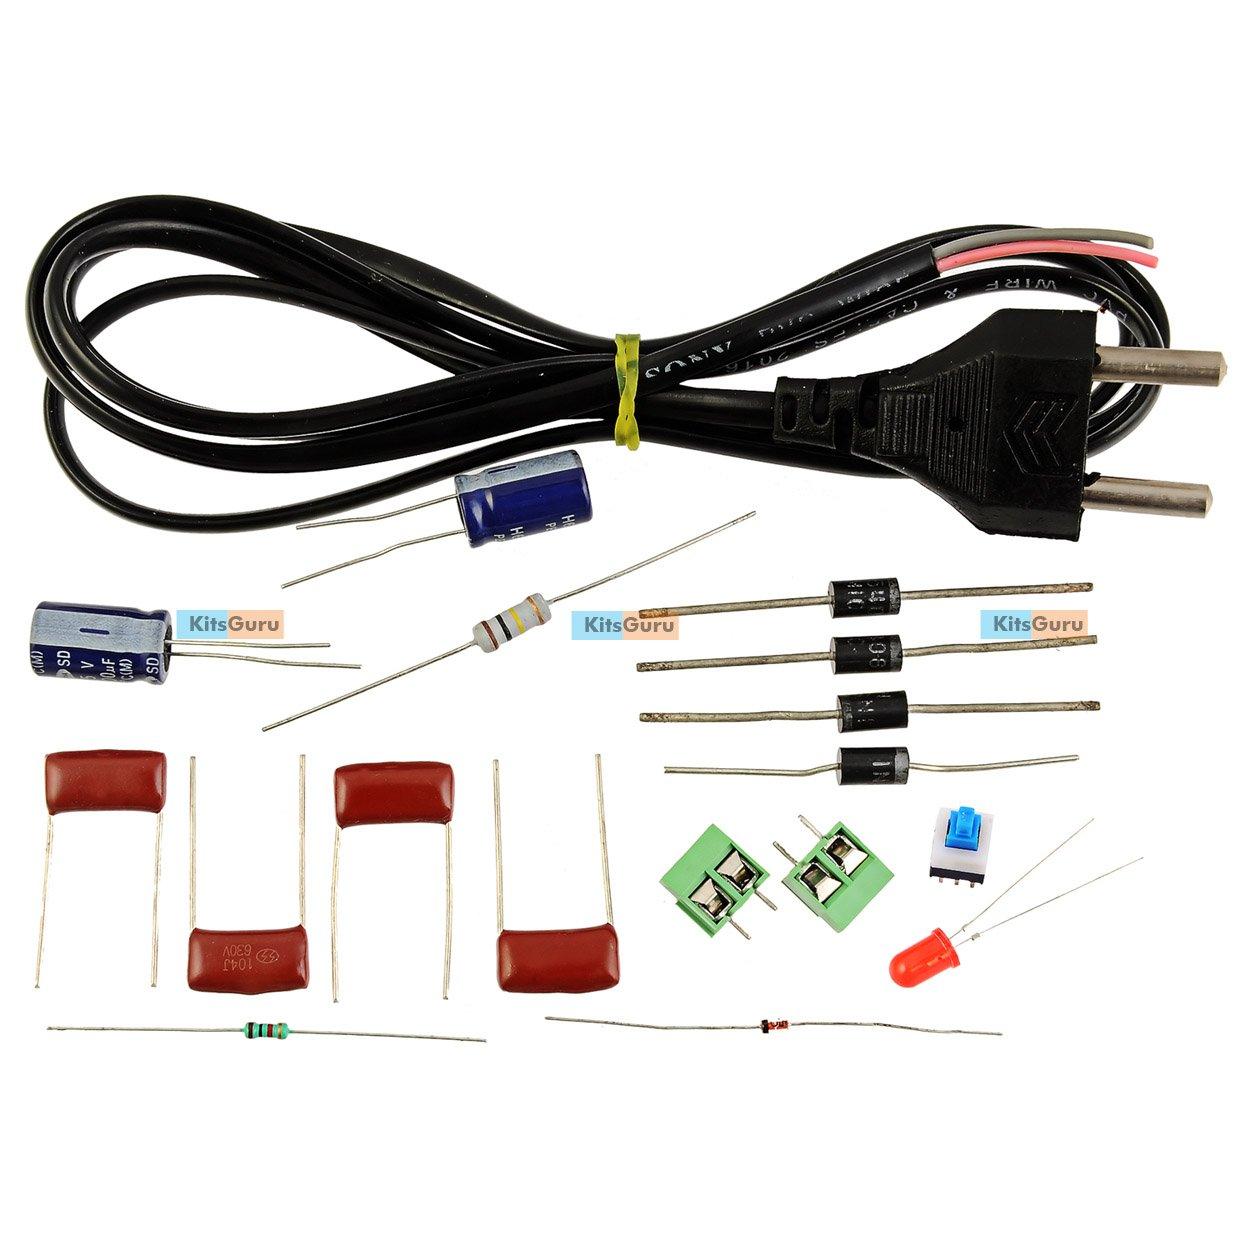 Diy Kit Transformerless Power Supply Lgkt113 Digital Circuits Current Circuit Diagram Centre